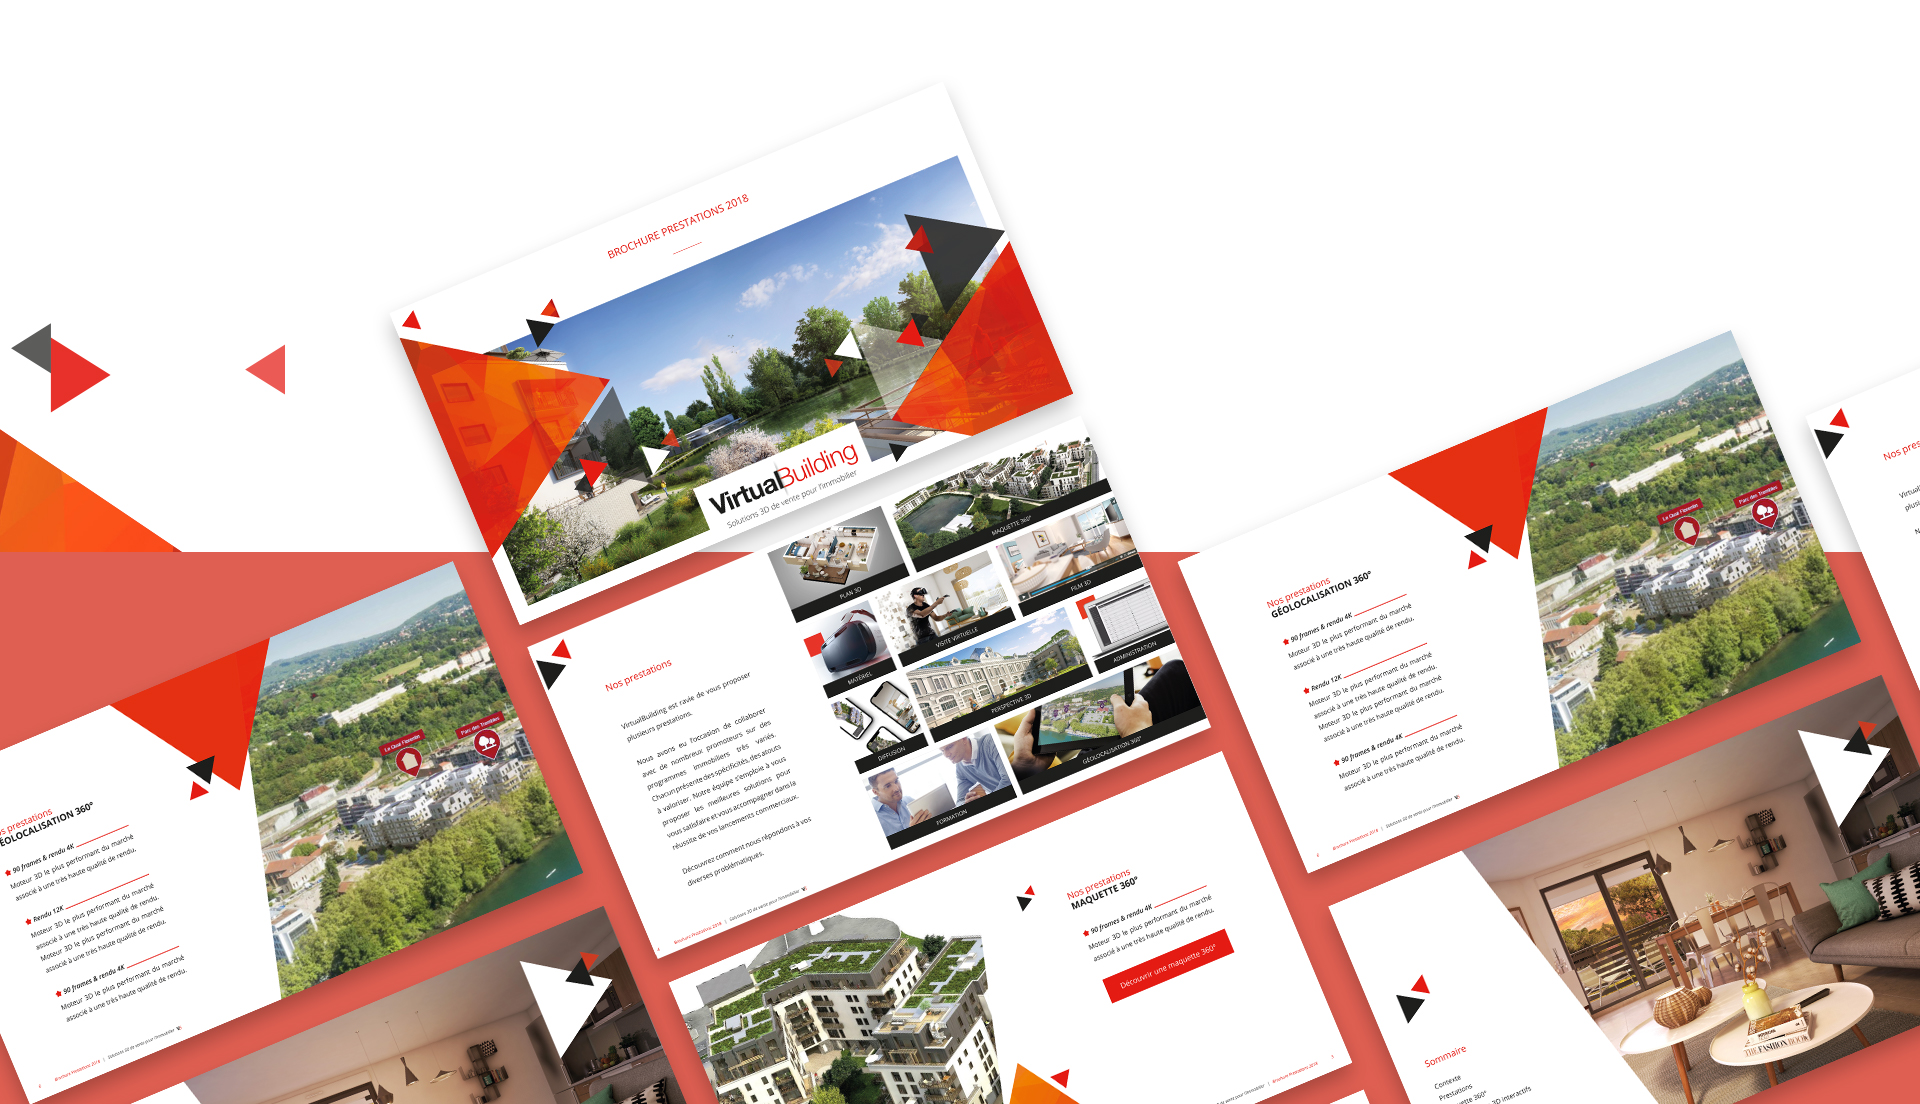 Conception de la brochure commerciale & digitale de VirtualBuilding